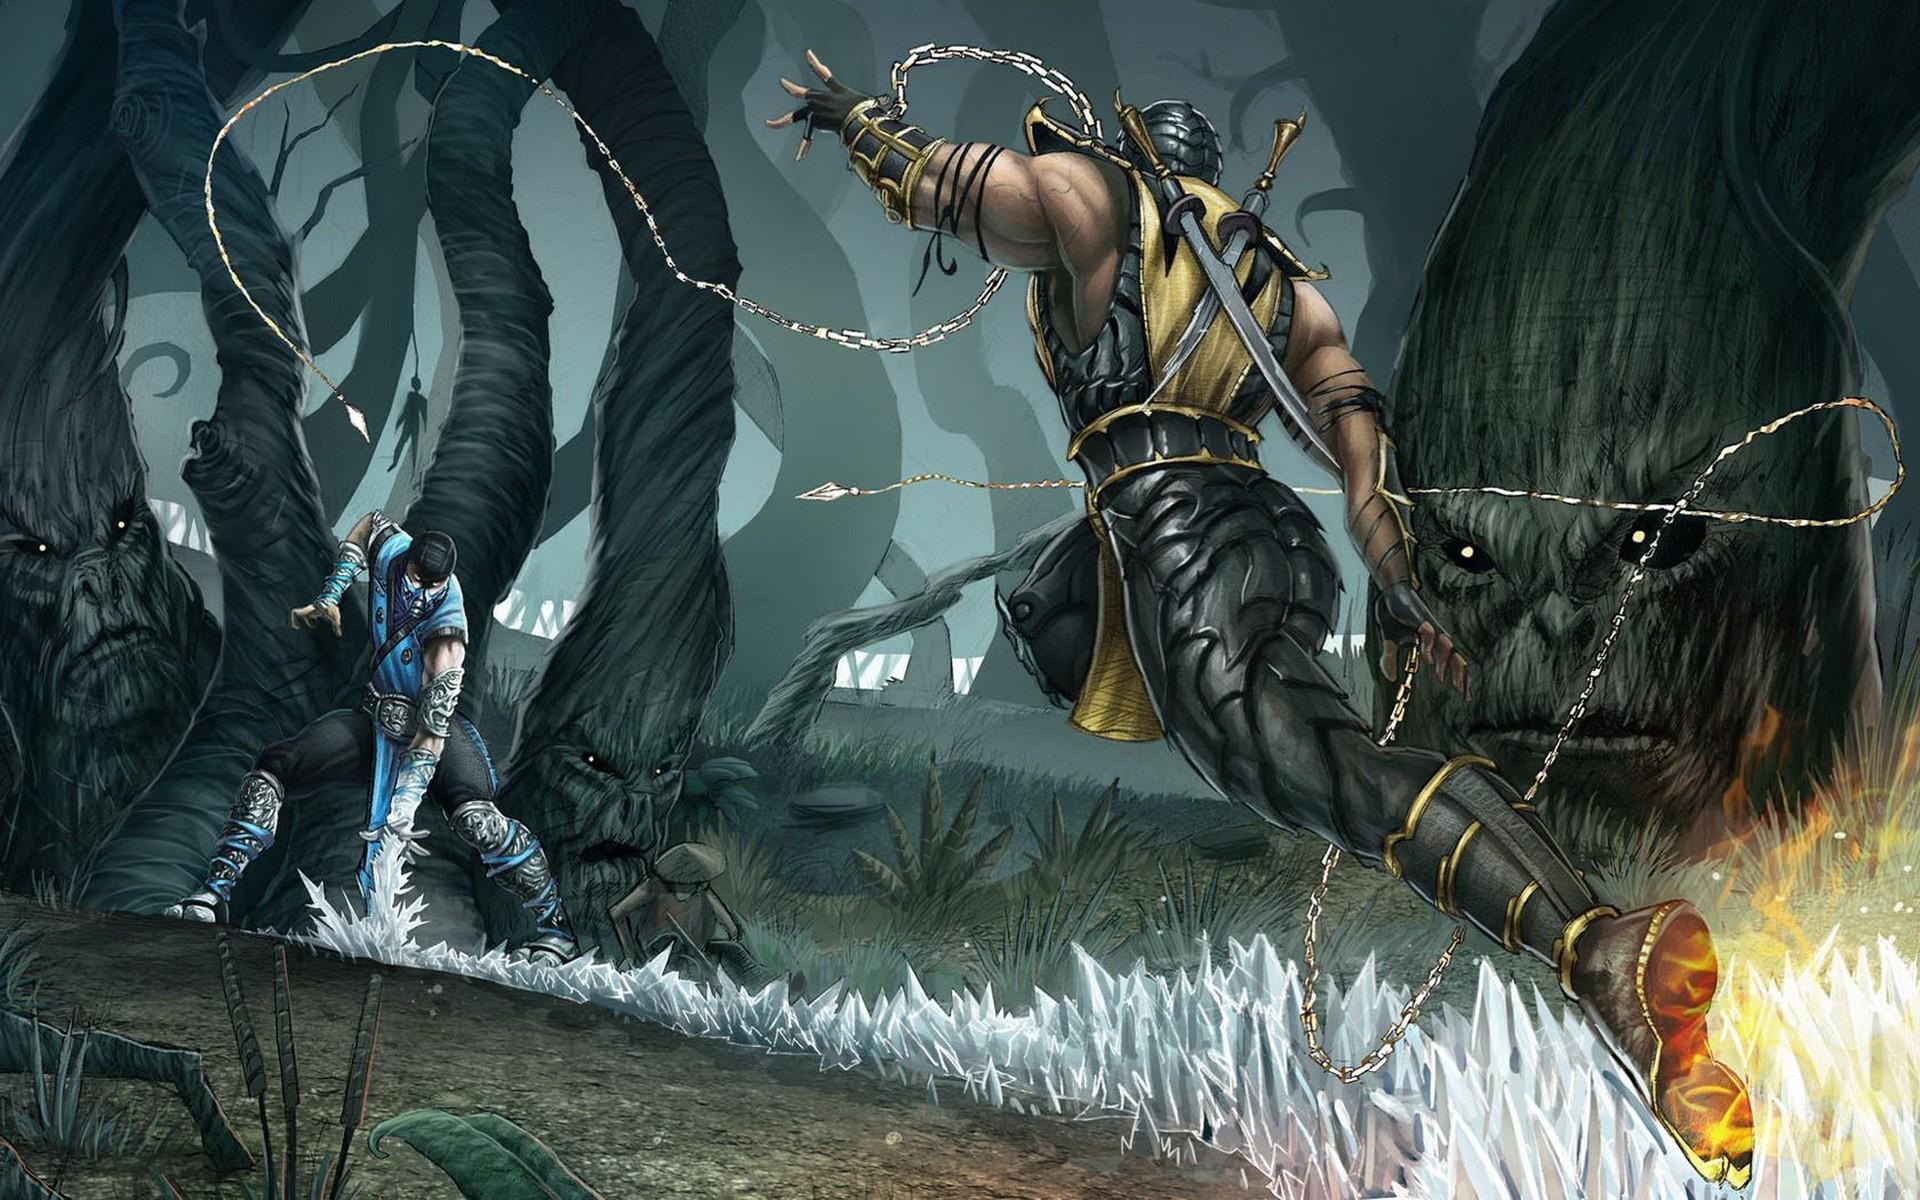 Sub Zero Mortal Kombat Comics Mythology Scorpion Screenshot Computer Wallpaper Pc Game